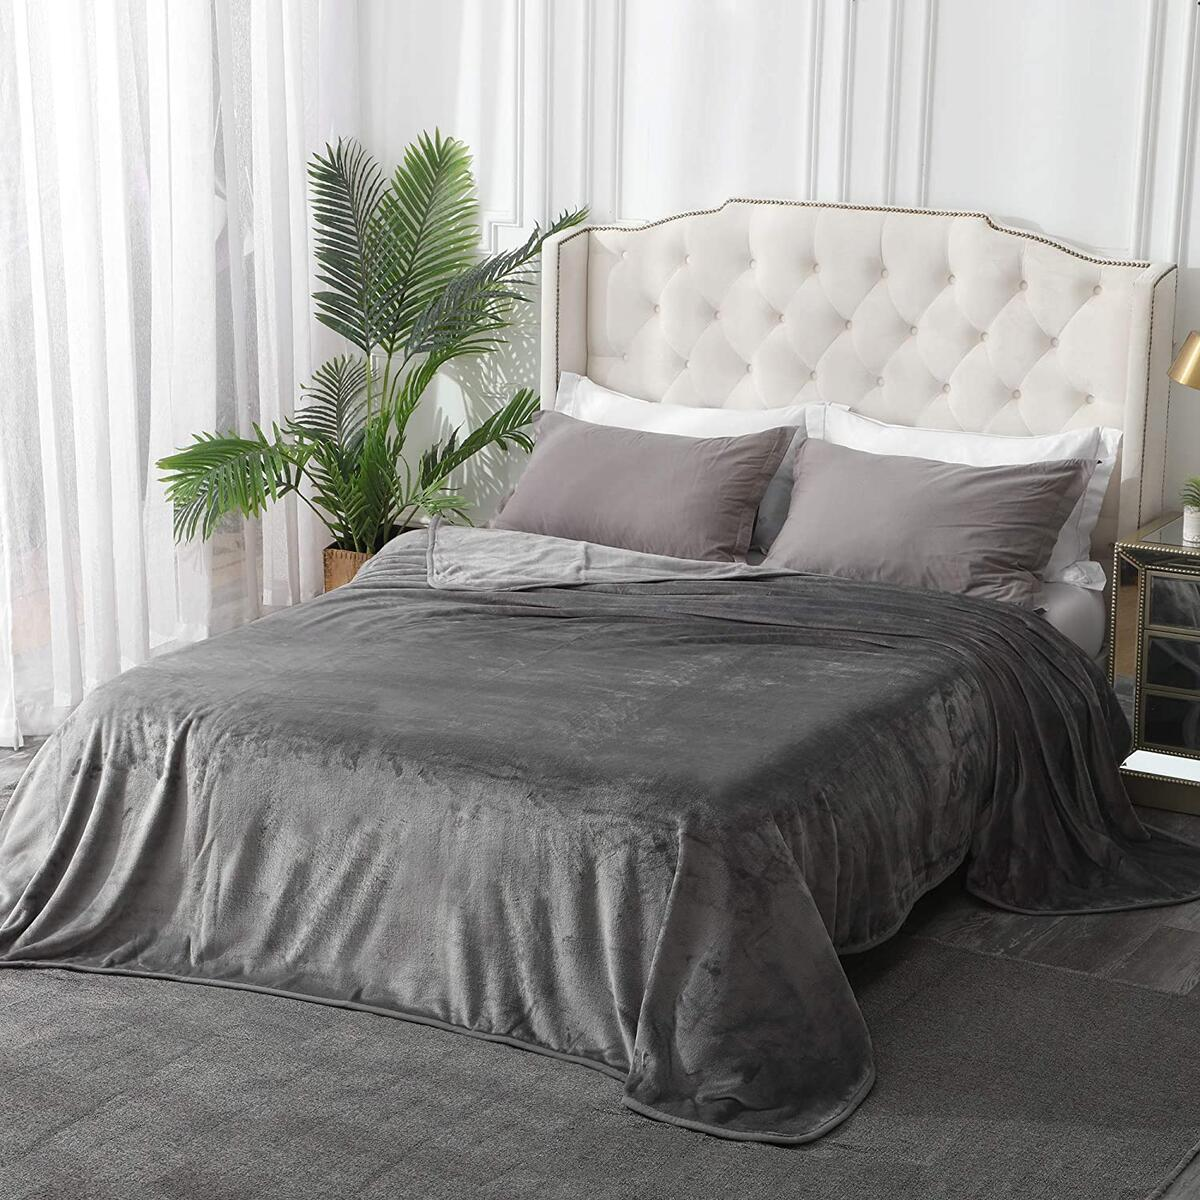 Leeden Ultra Soft Throw Blanket King Size All Season Flannel Fleece Blankets Throws for Couch Sofa Bed Plush Thick Warm Fuzzy Anti-Static Lightweight Microfiber (Dark Grey,108